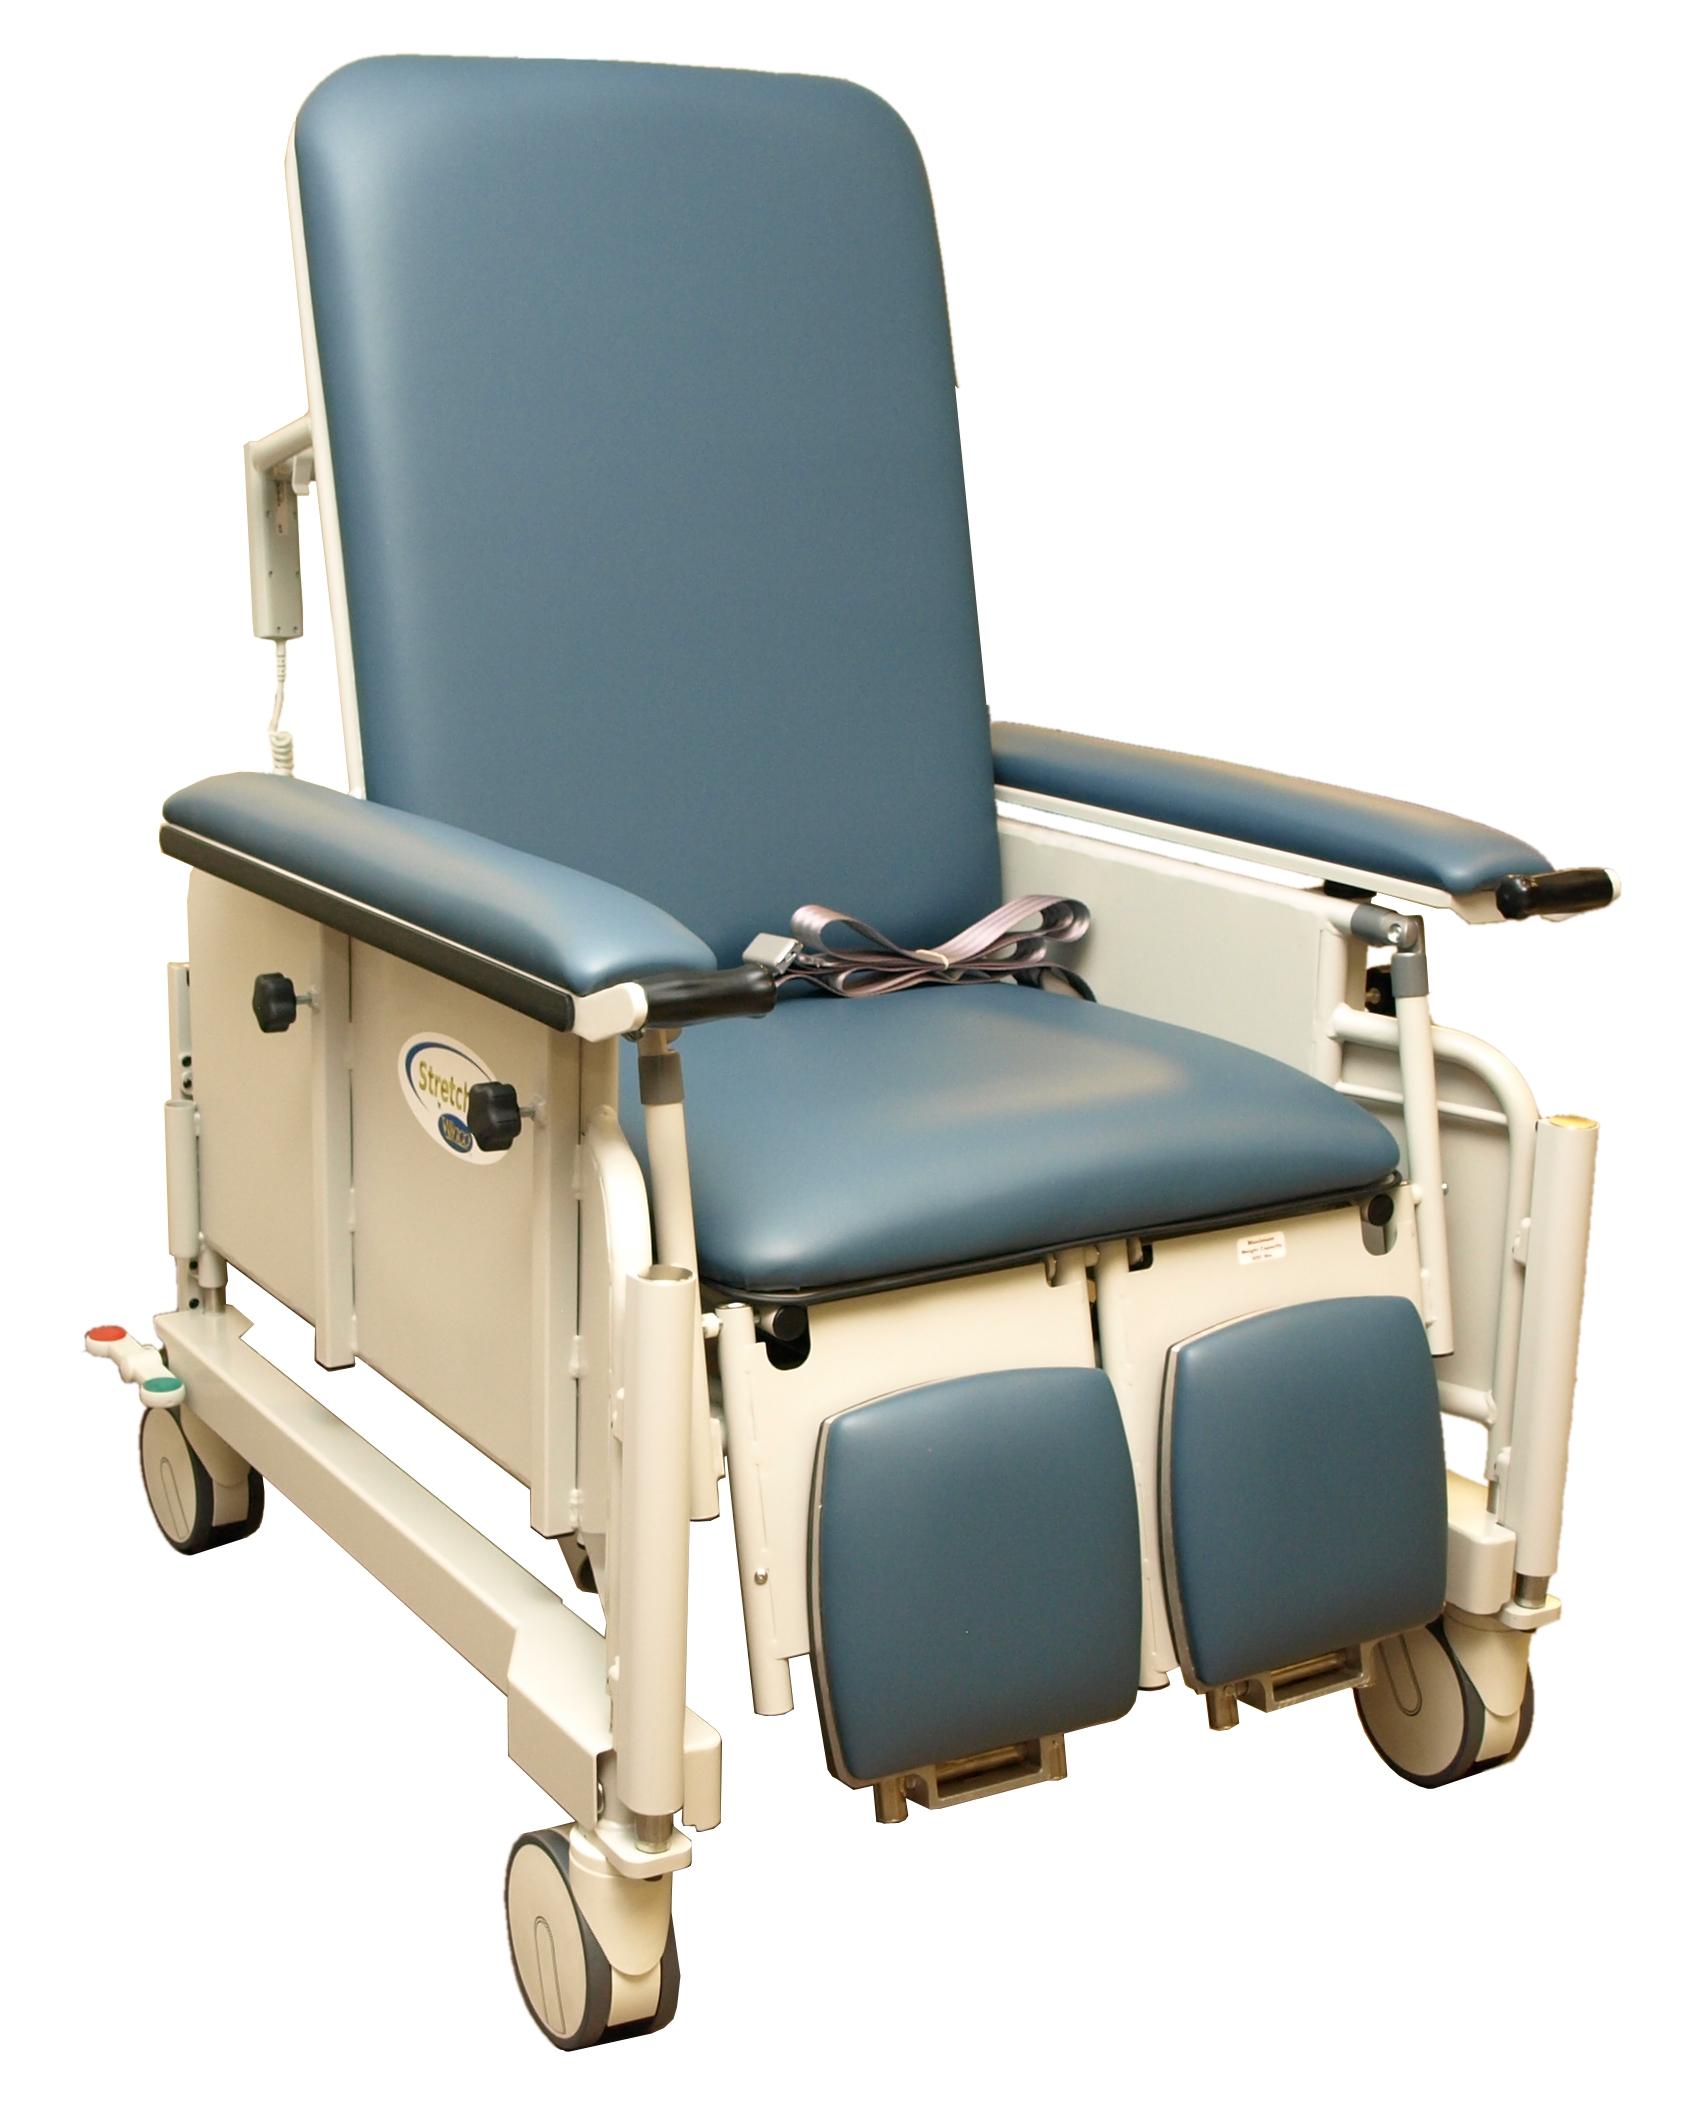 Winco S550 Stretchair